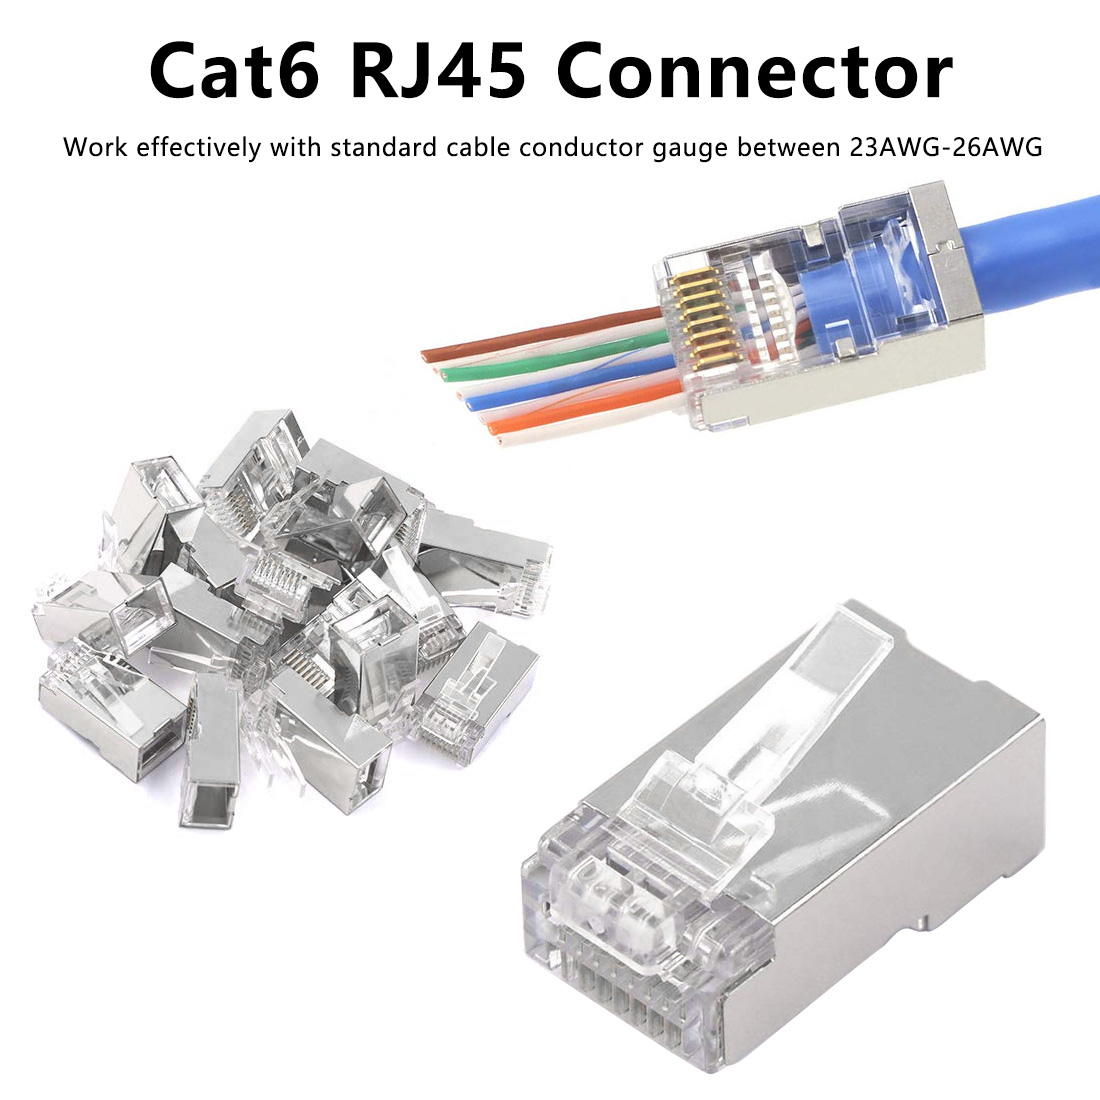 Networkingcable Cat6 RJ45 Connector Modular Ethernet Cable Head Plug Cat 6 Crimp Network RJ 45 Gold-plated